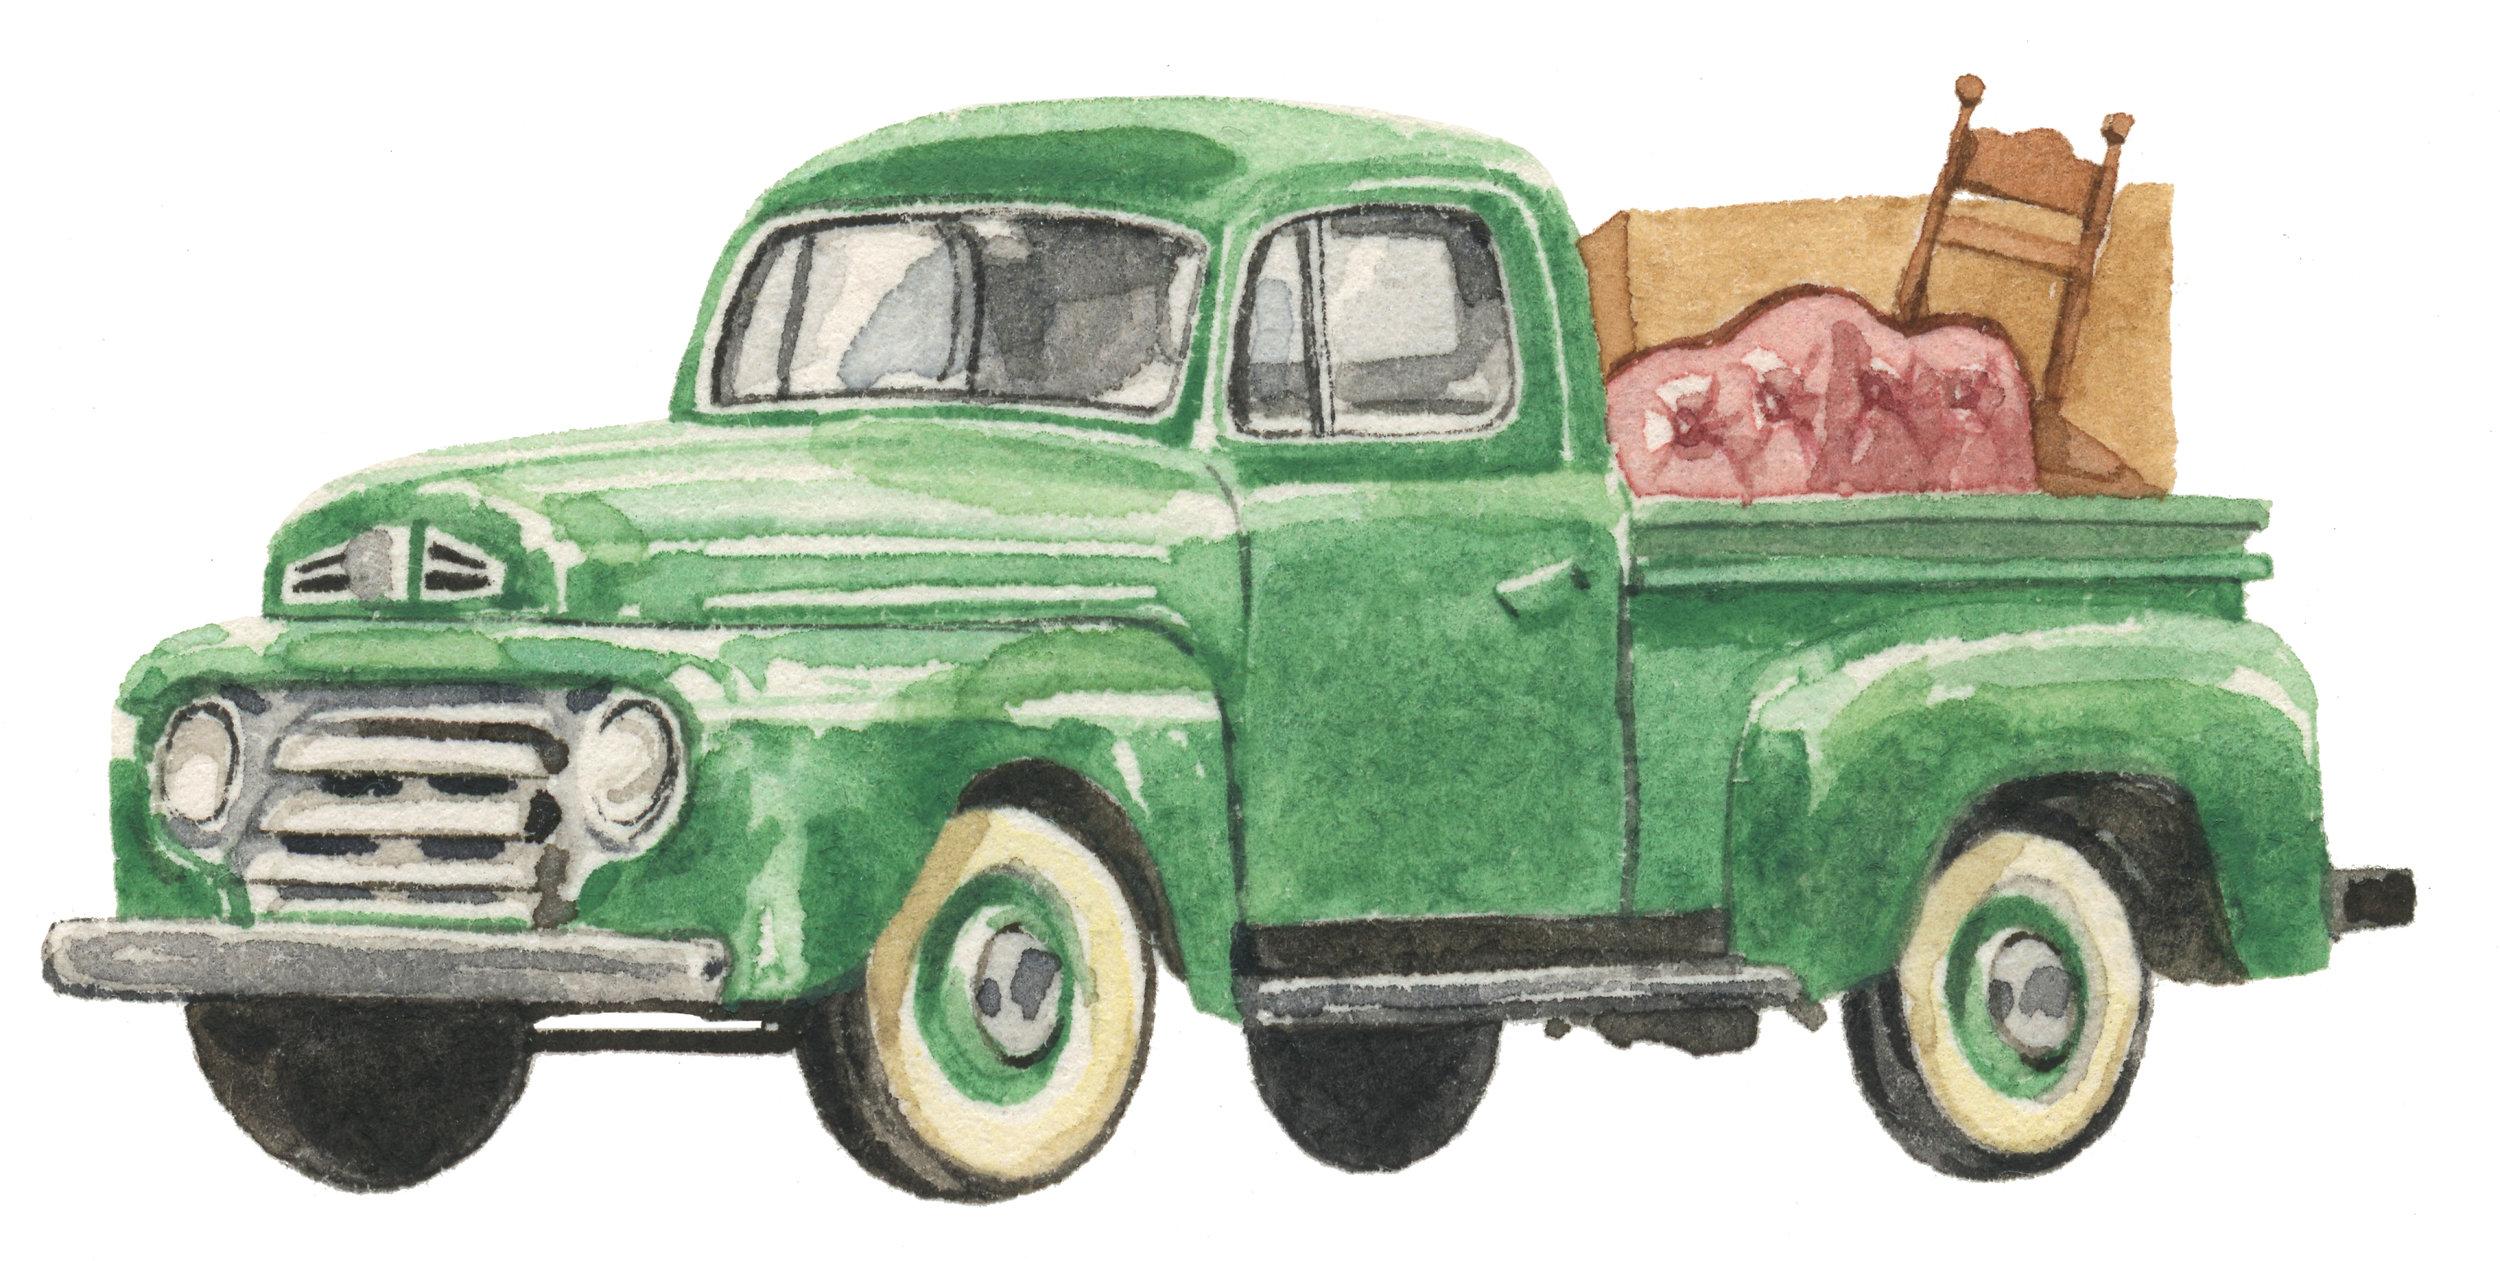 pickup-truck-lrg.jpg